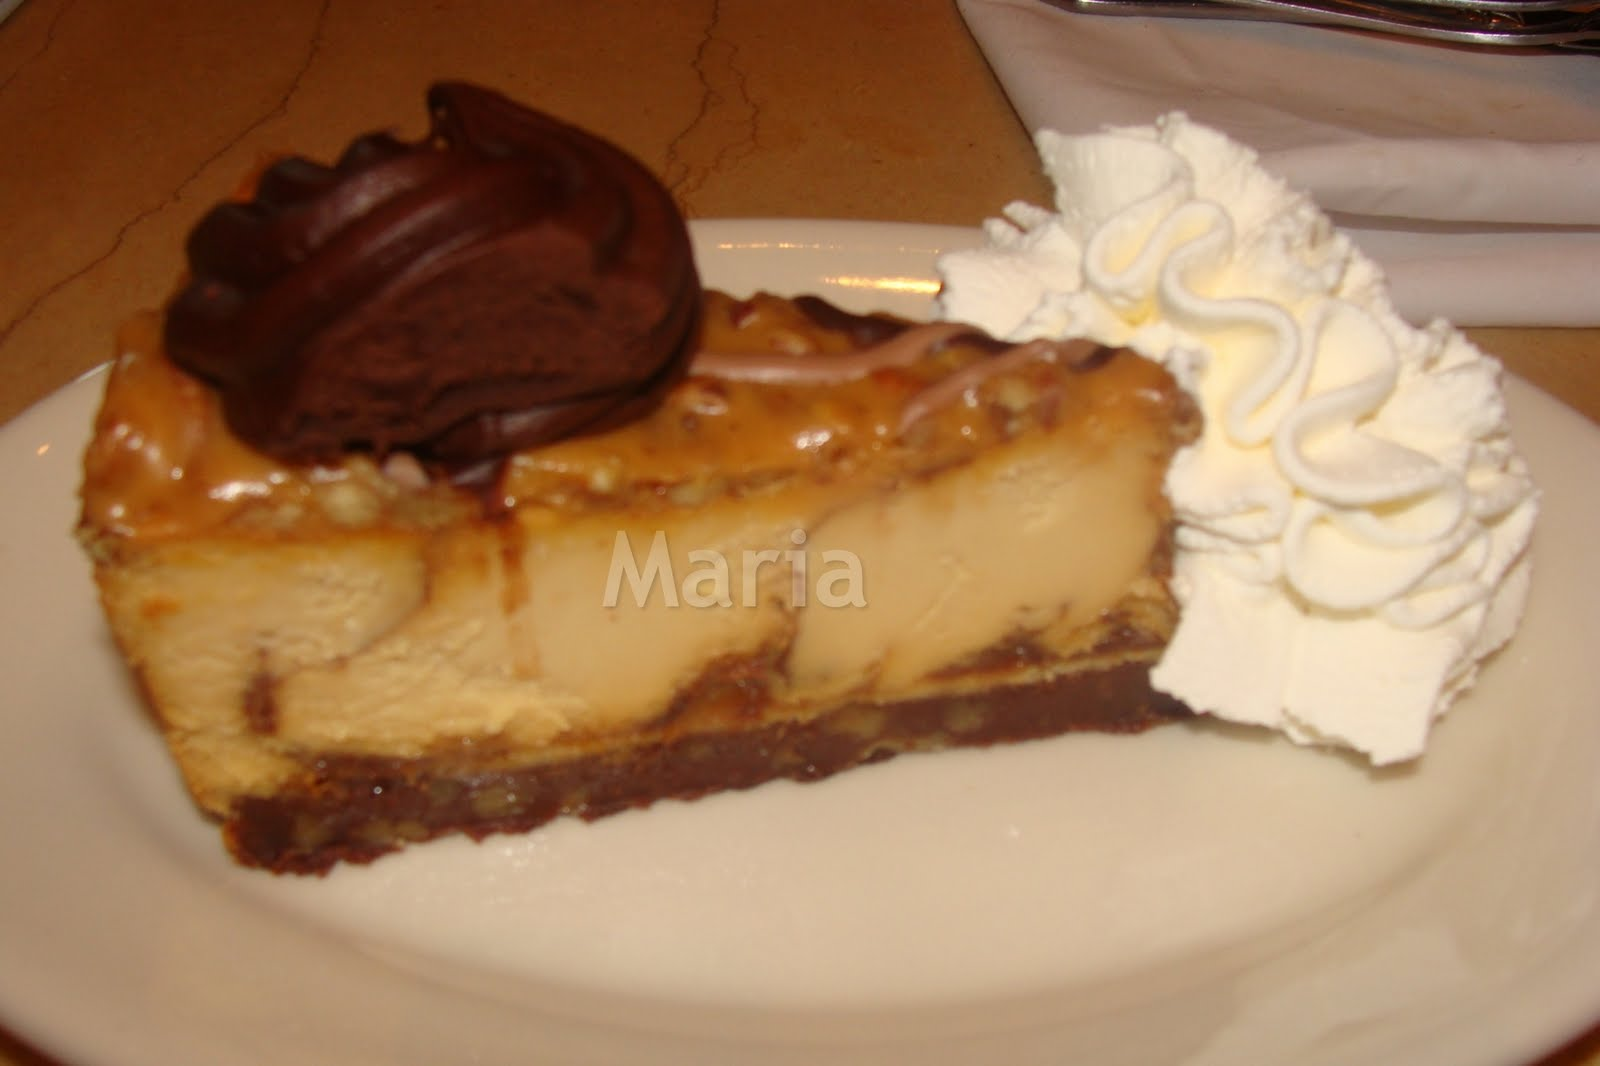 Food and Beverage Stop: Caramel Pecan Turtle Cheesecake